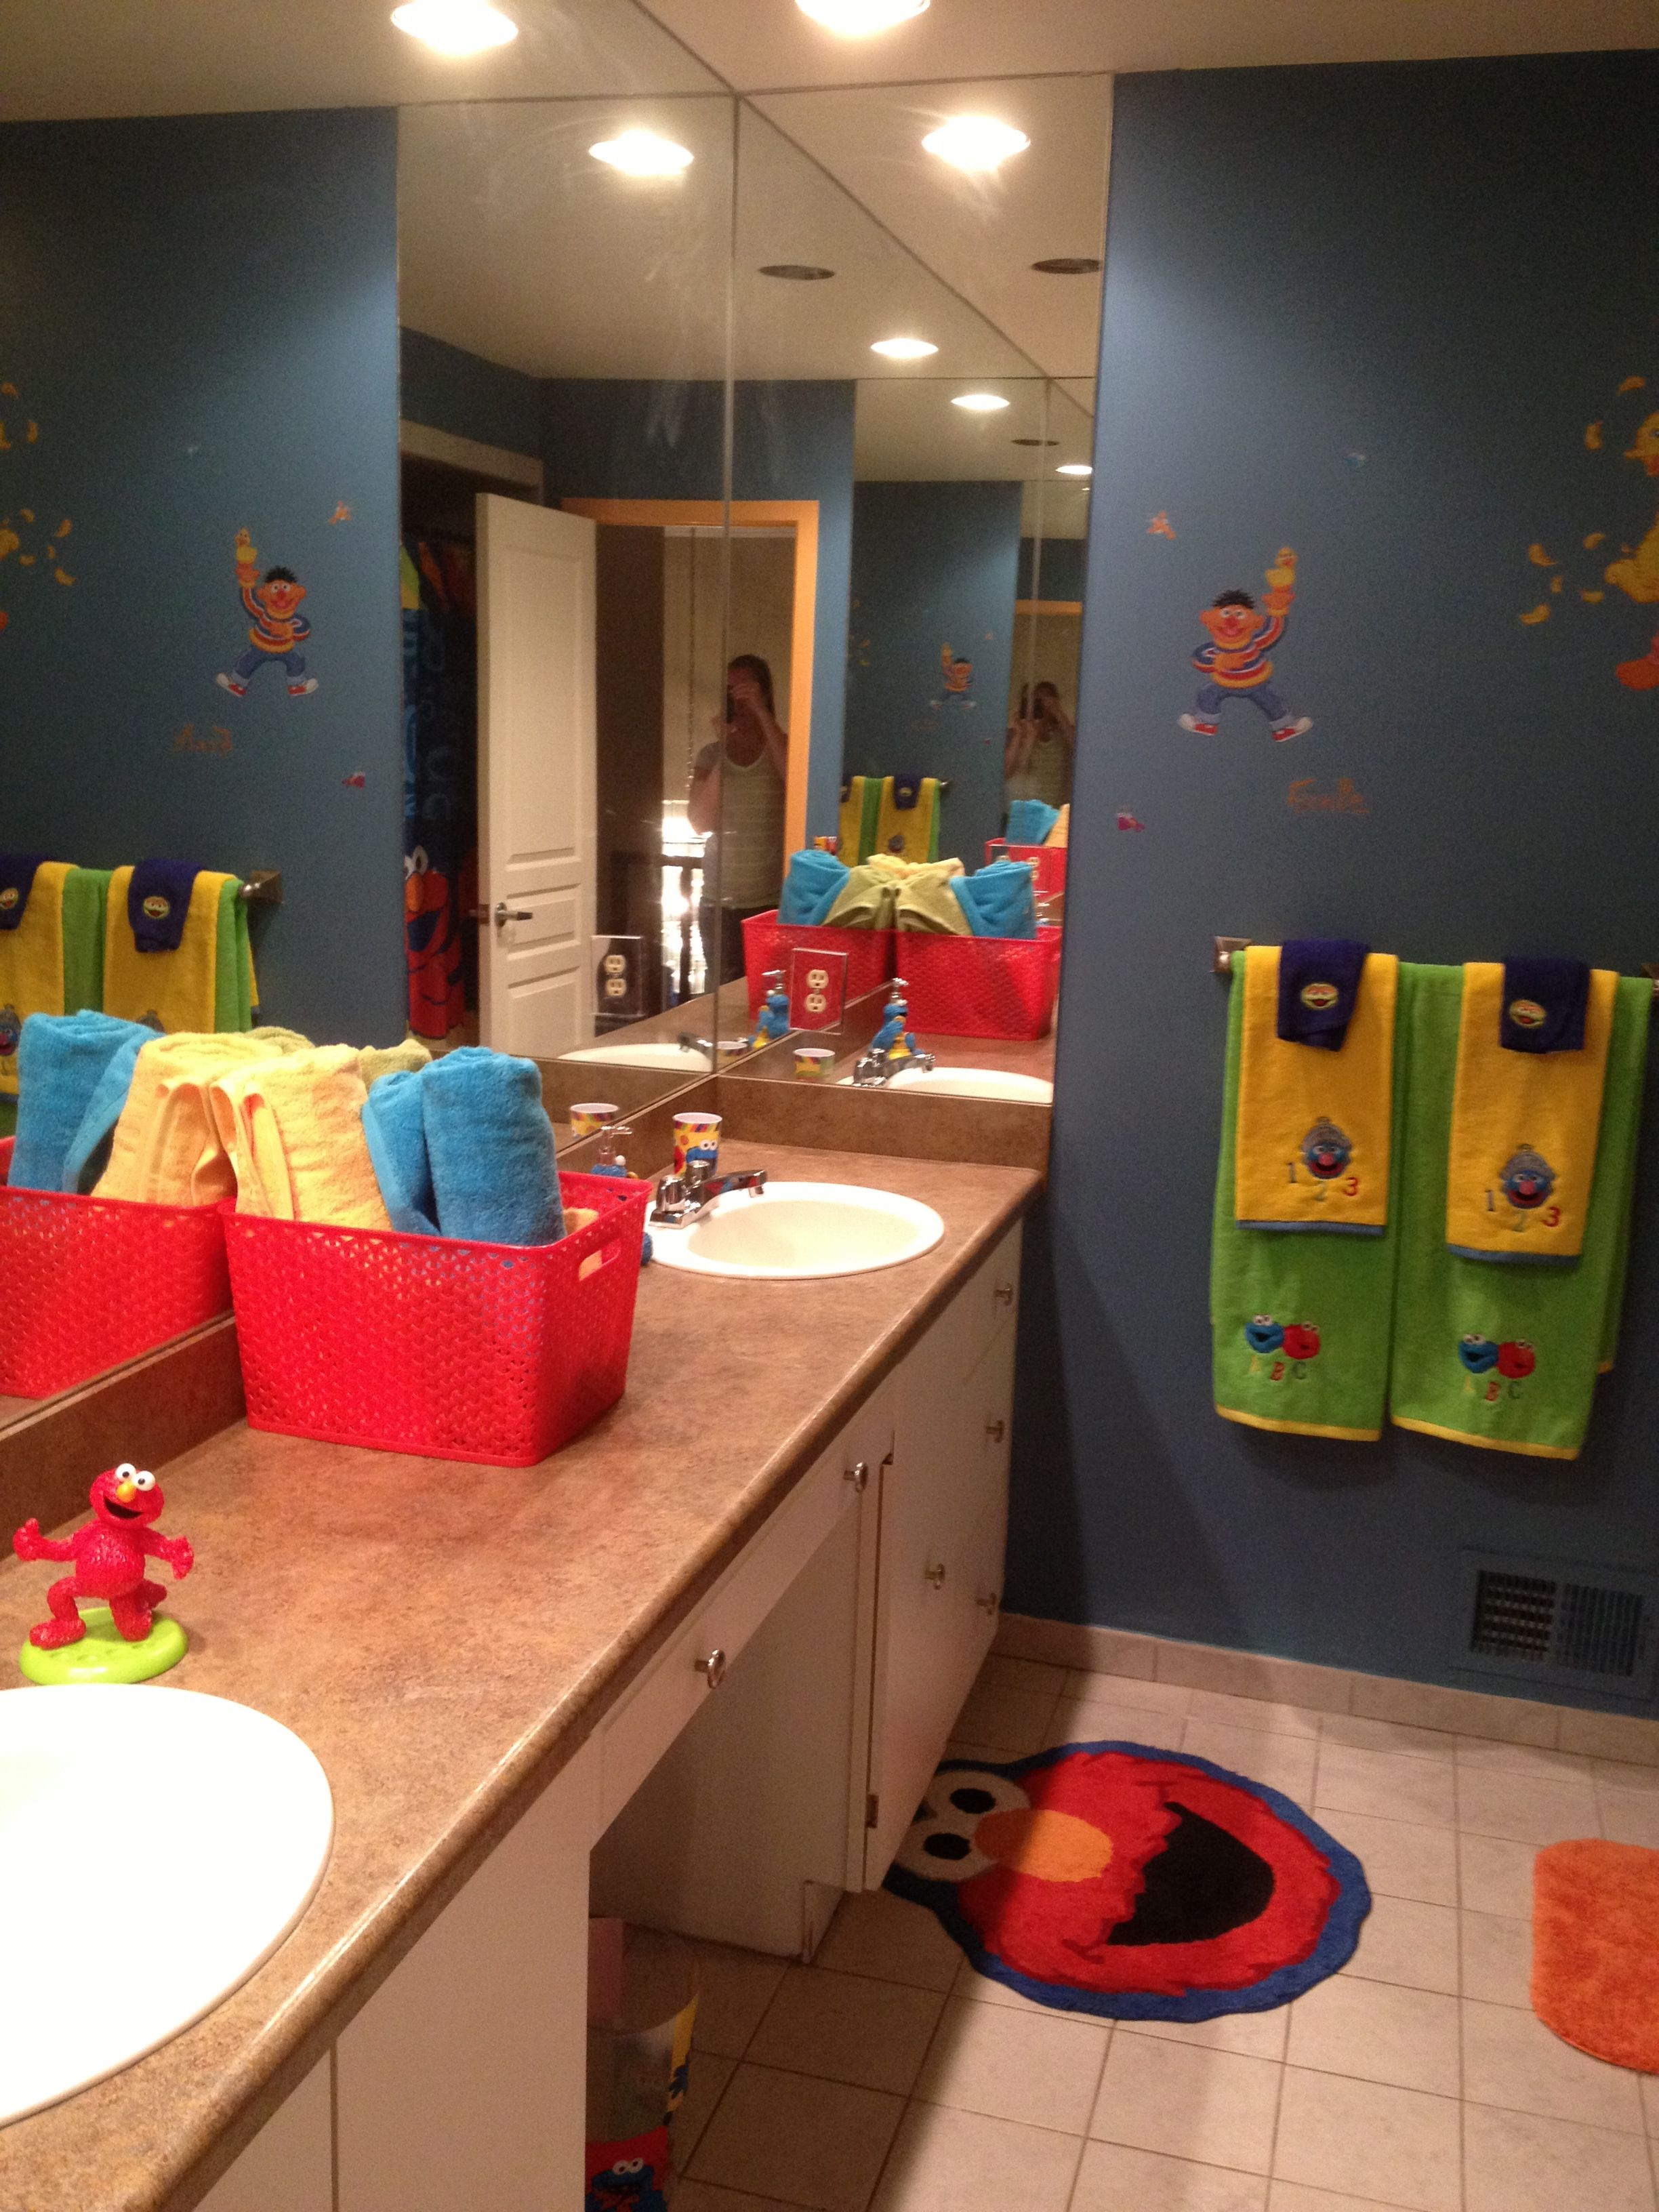 Sesame Street Bathroom With Images Bathroom Decor Sets Boys